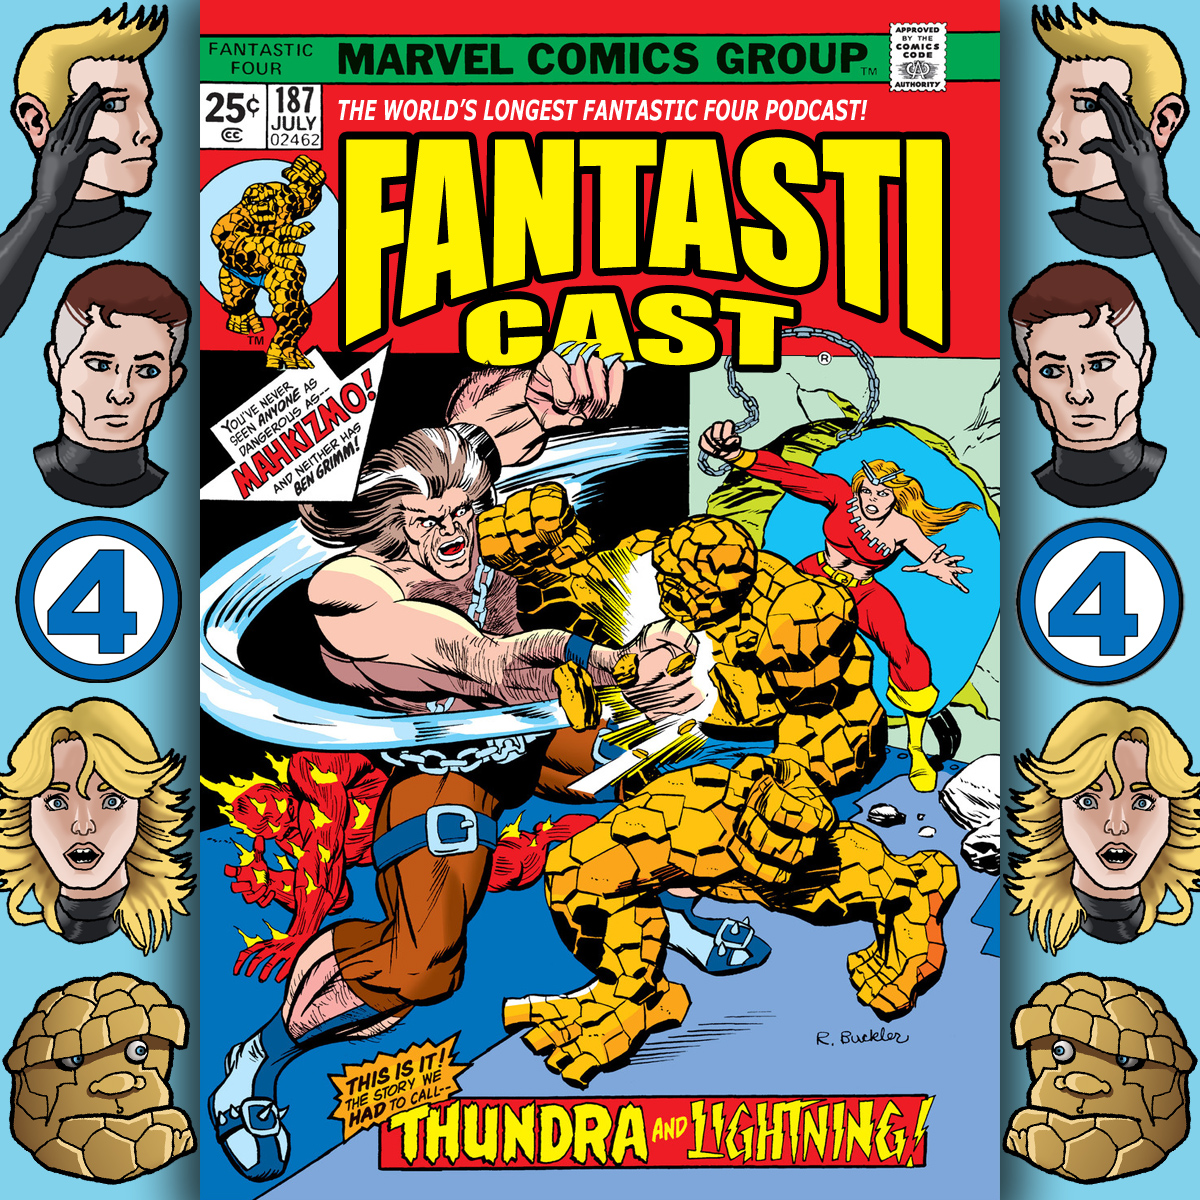 Episode 187: Fantastic Four #151 - Thundra And Lightning Part One